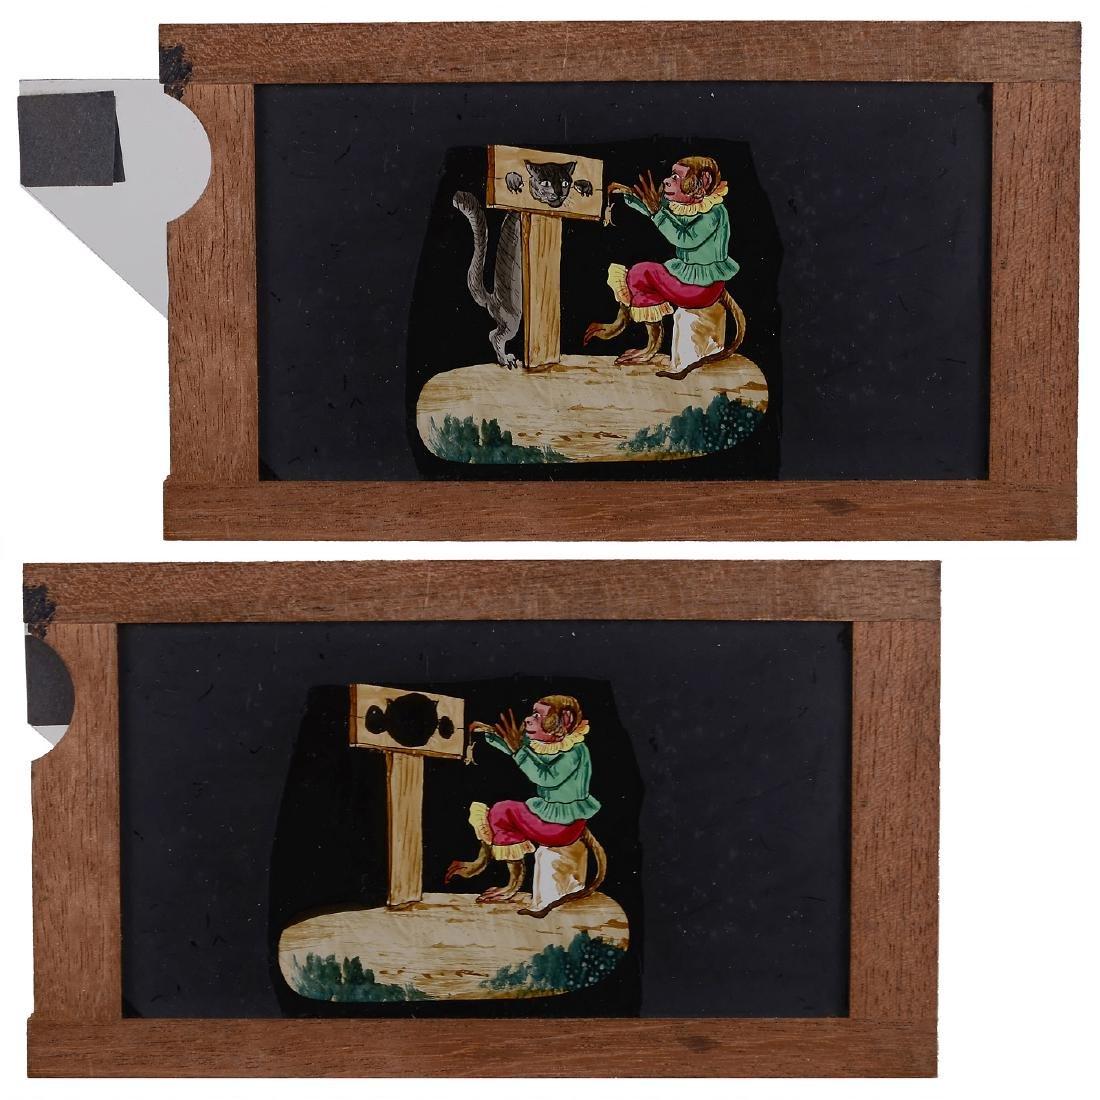 3 Mechanical Magic Lantern Slides of Monkeys - 2